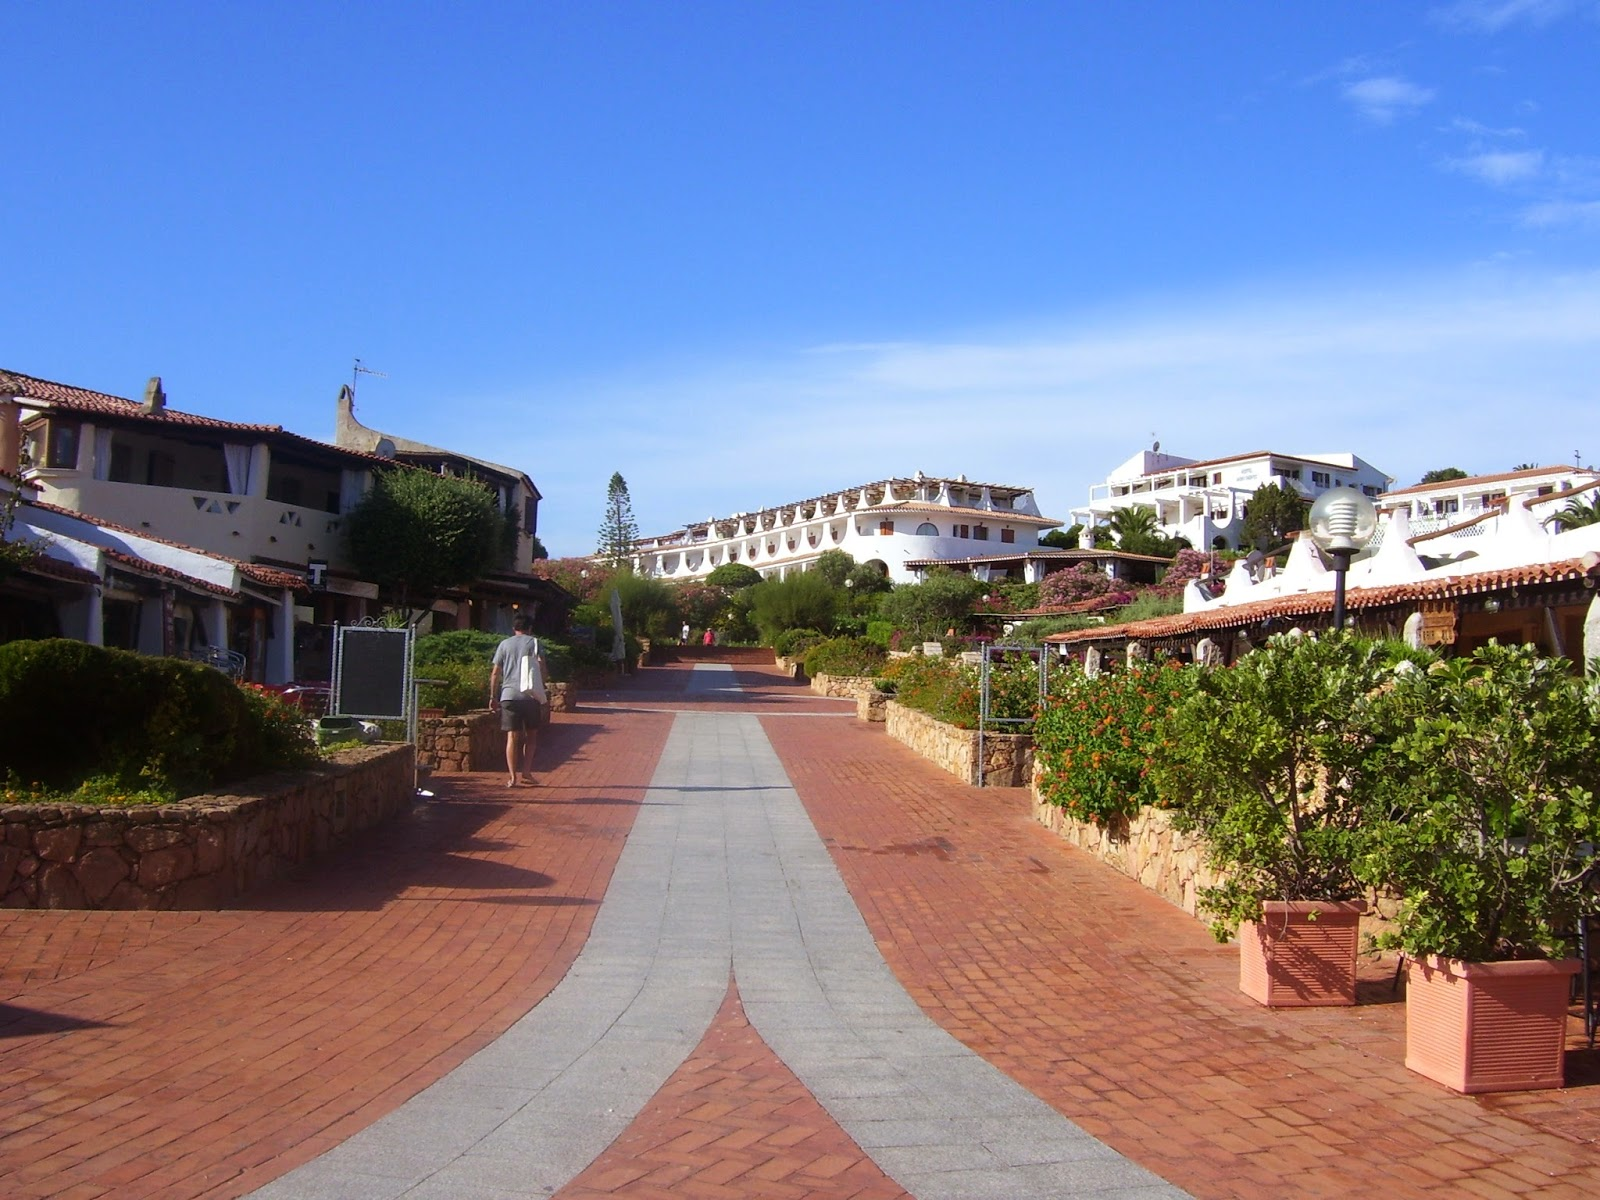 Baja Sardinia Italy  city images : ... porto baja sardinia a baja sardinia la sabbia è sottile baja sardinia